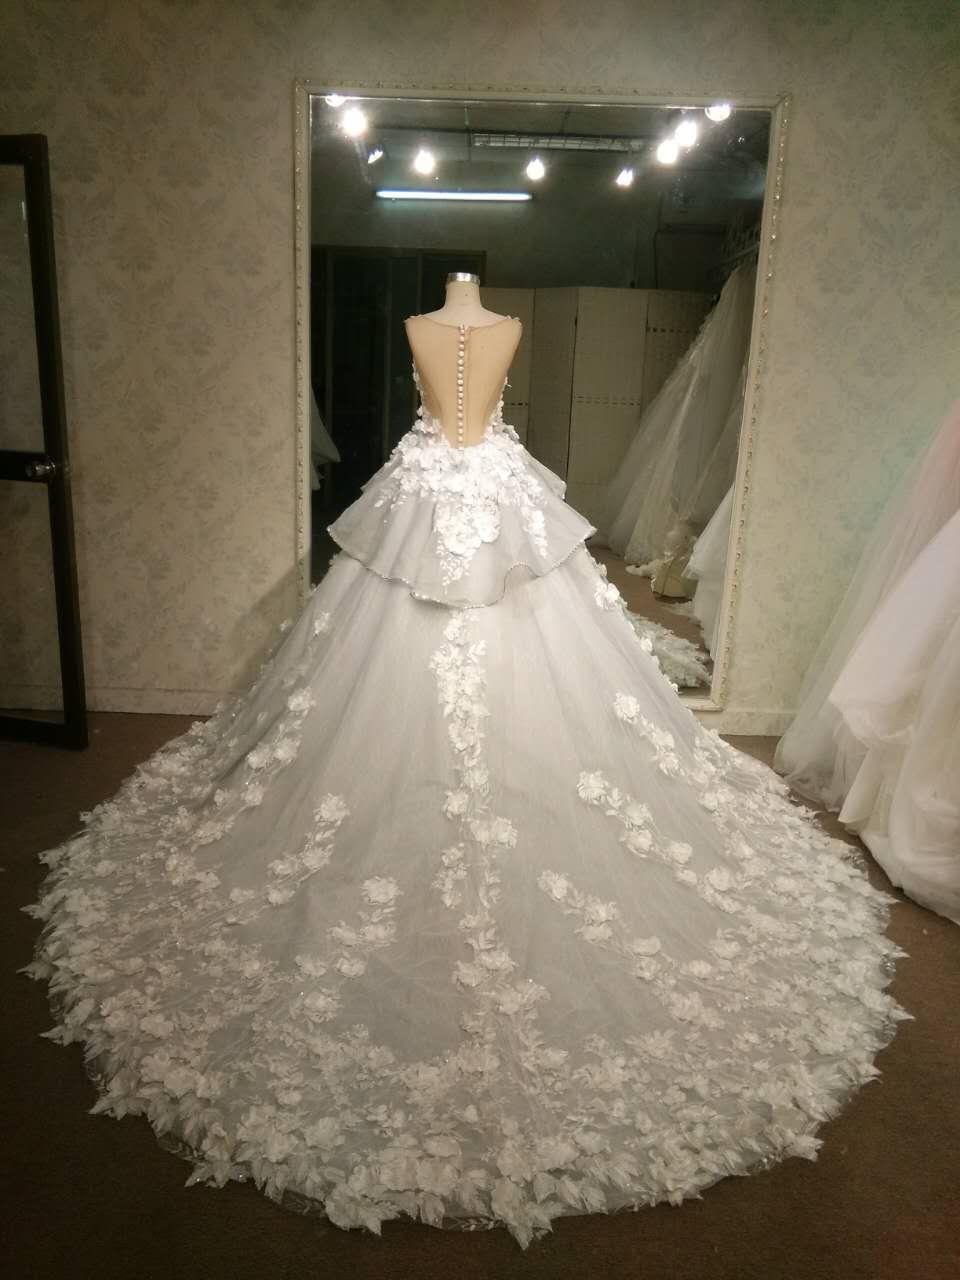 Peplum style flower wedding dress from Darius Bridal